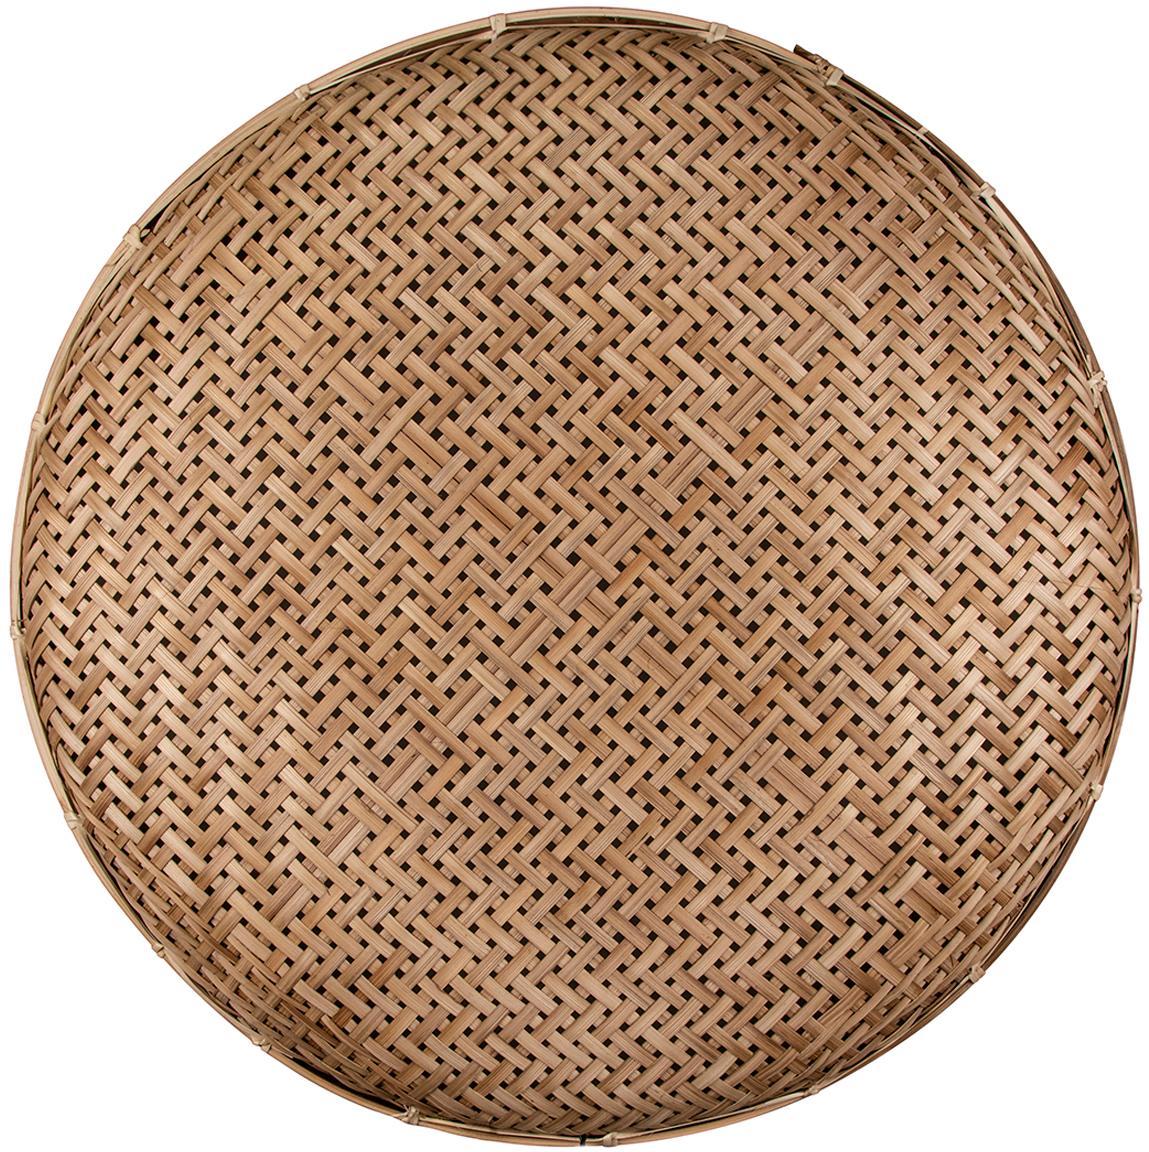 Applique in rattan con spina Aruba, Paralume: rattan, Rattan, Ø 50 x Prof. 5 cm